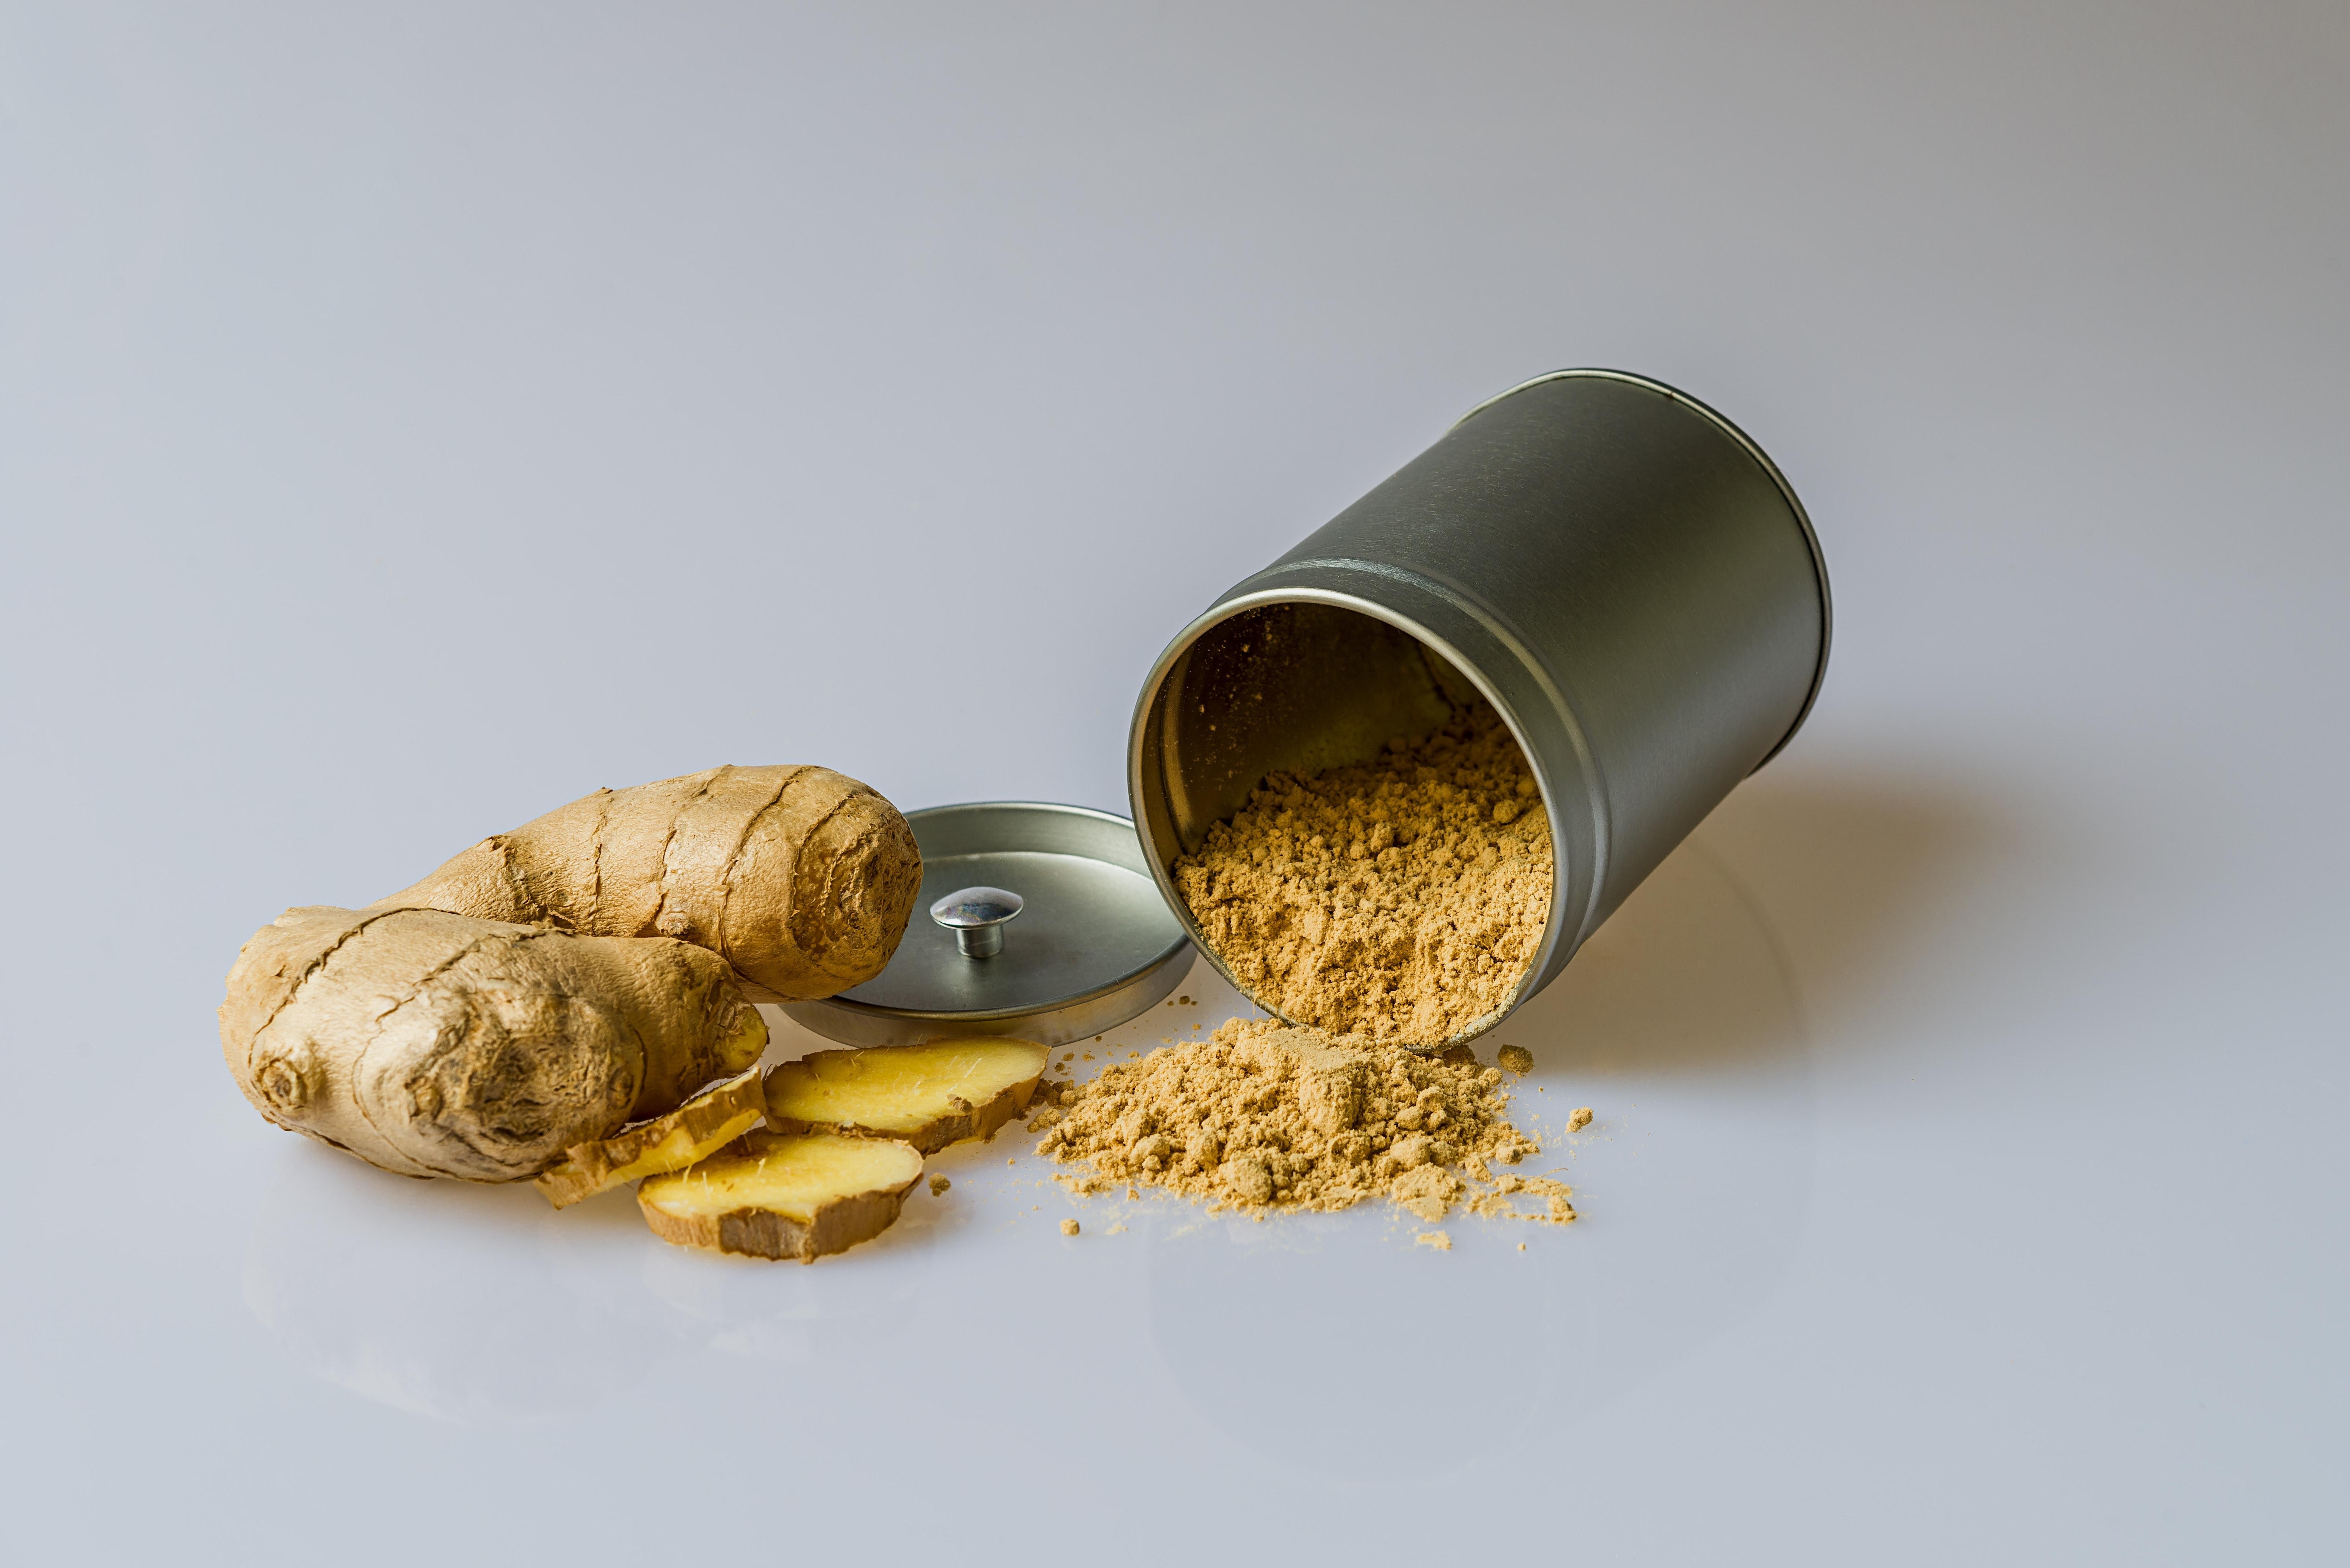 canister-food-ginger-161556.jpg